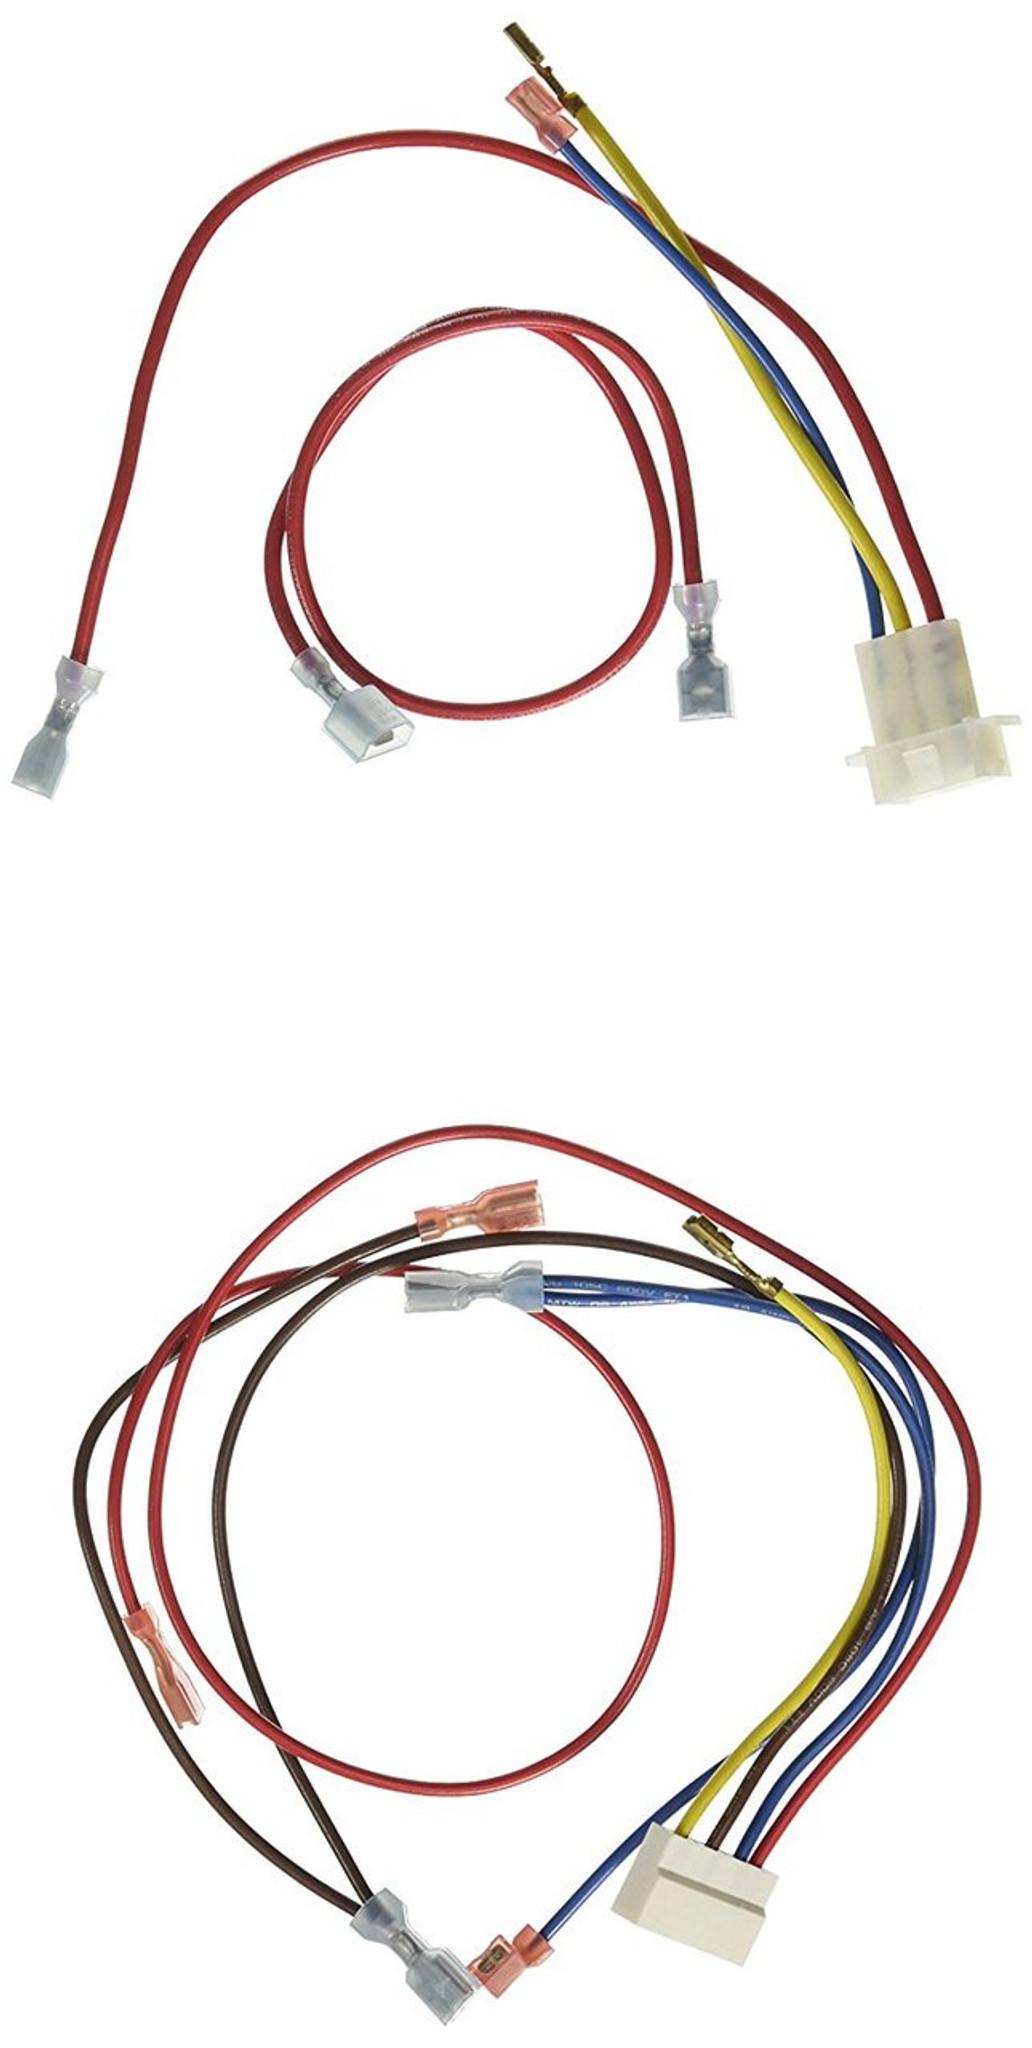 small resolution of suburban furnace wiring harness 520839 nt series suburban rv parts suburban rv furnace wiring harness